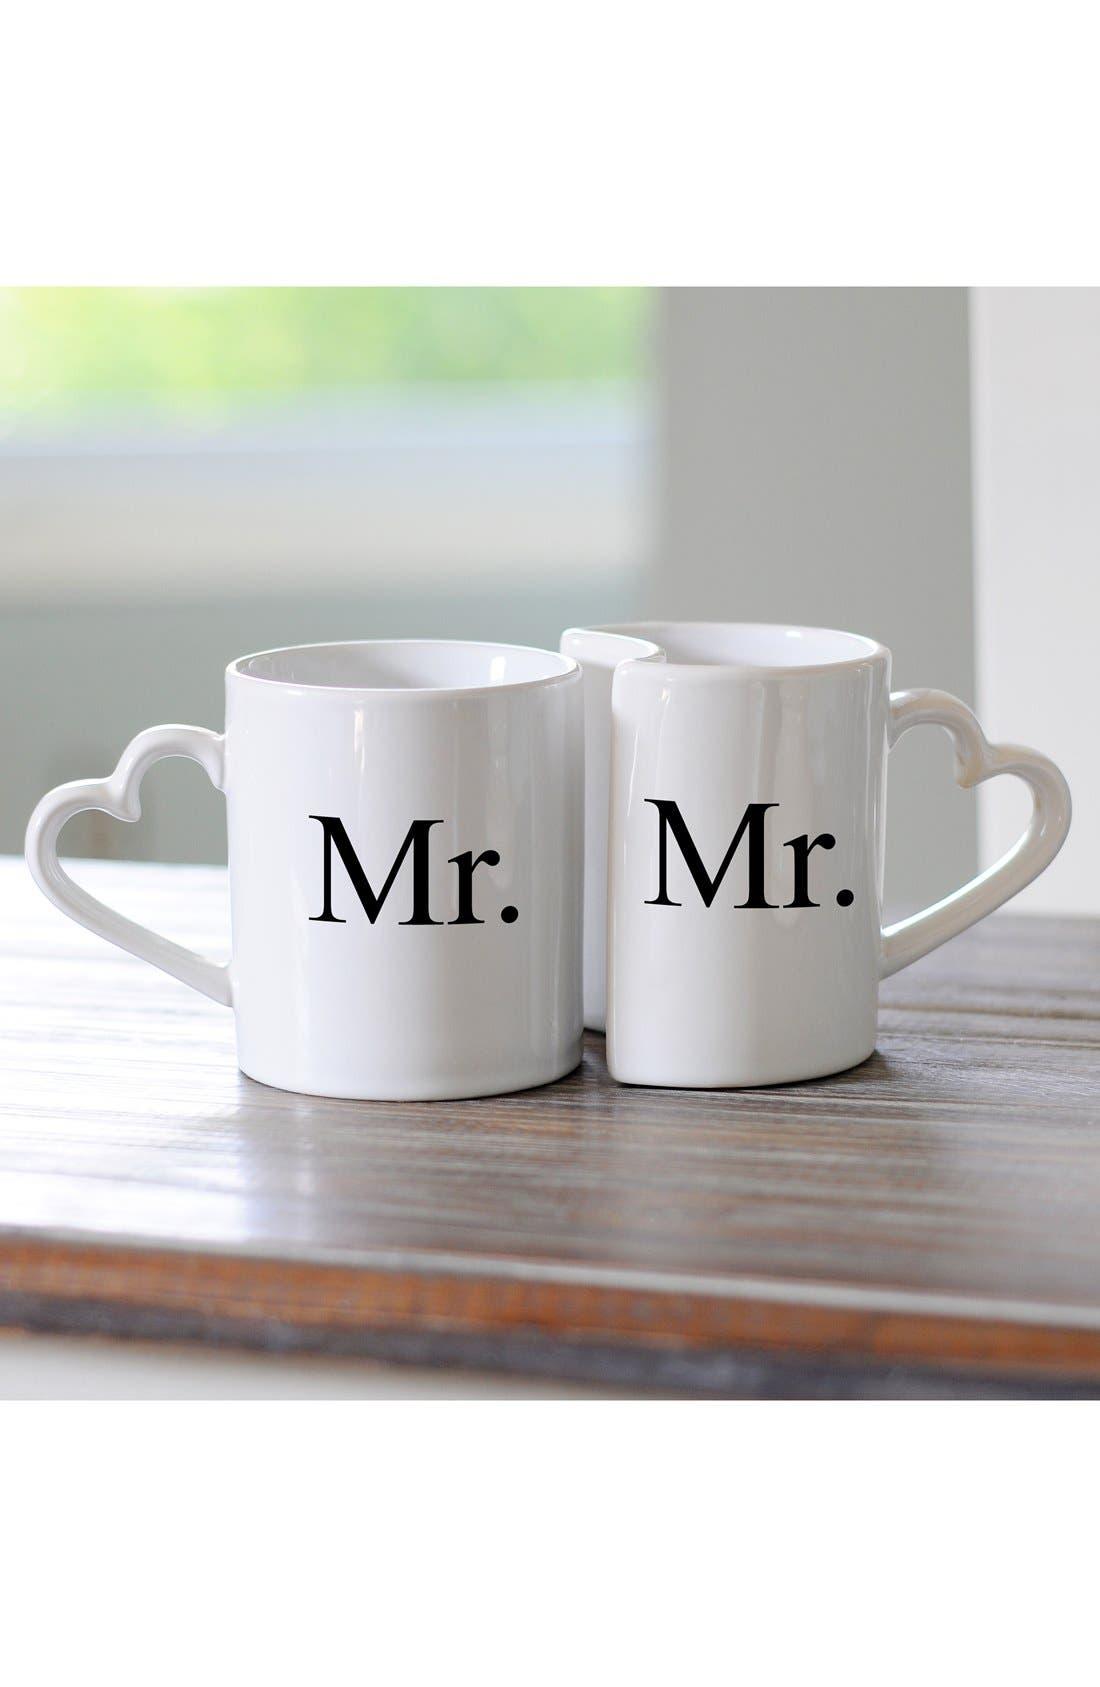 'For the Couple' Ceramic Coffee Mugs,                         Main,                         color, Mr/ Mr